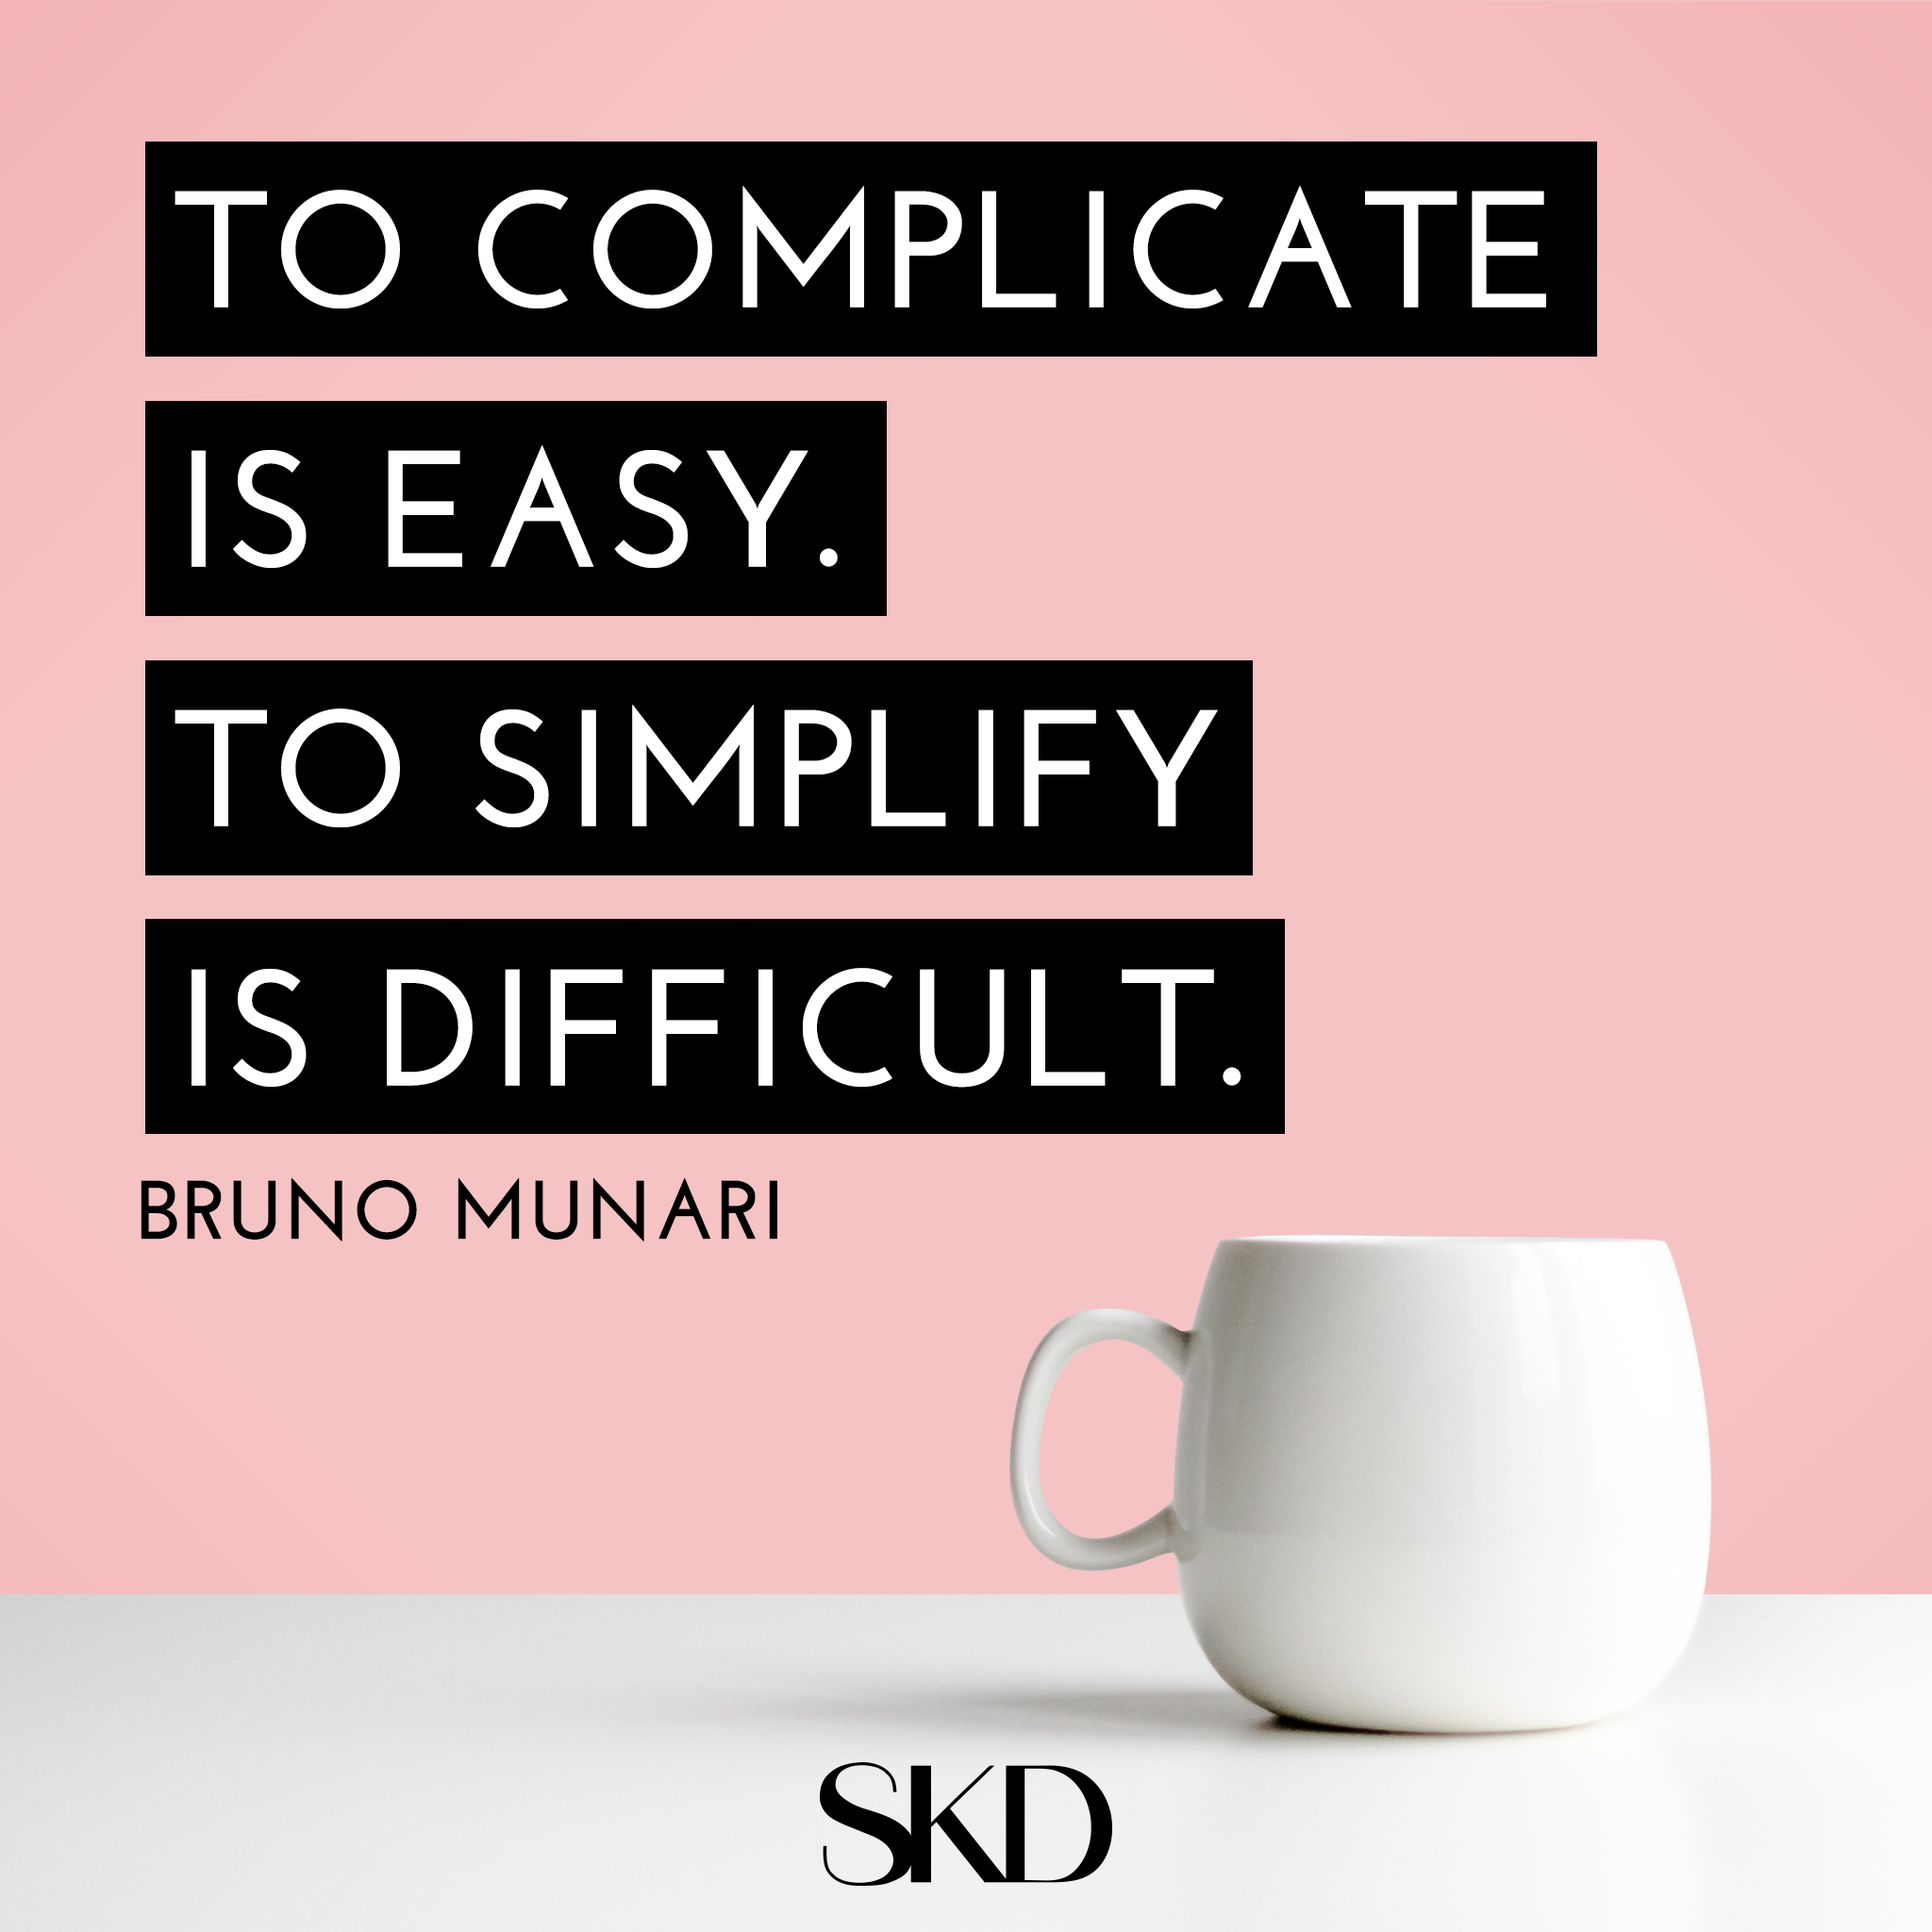 Simplify-Munari-Quote.png